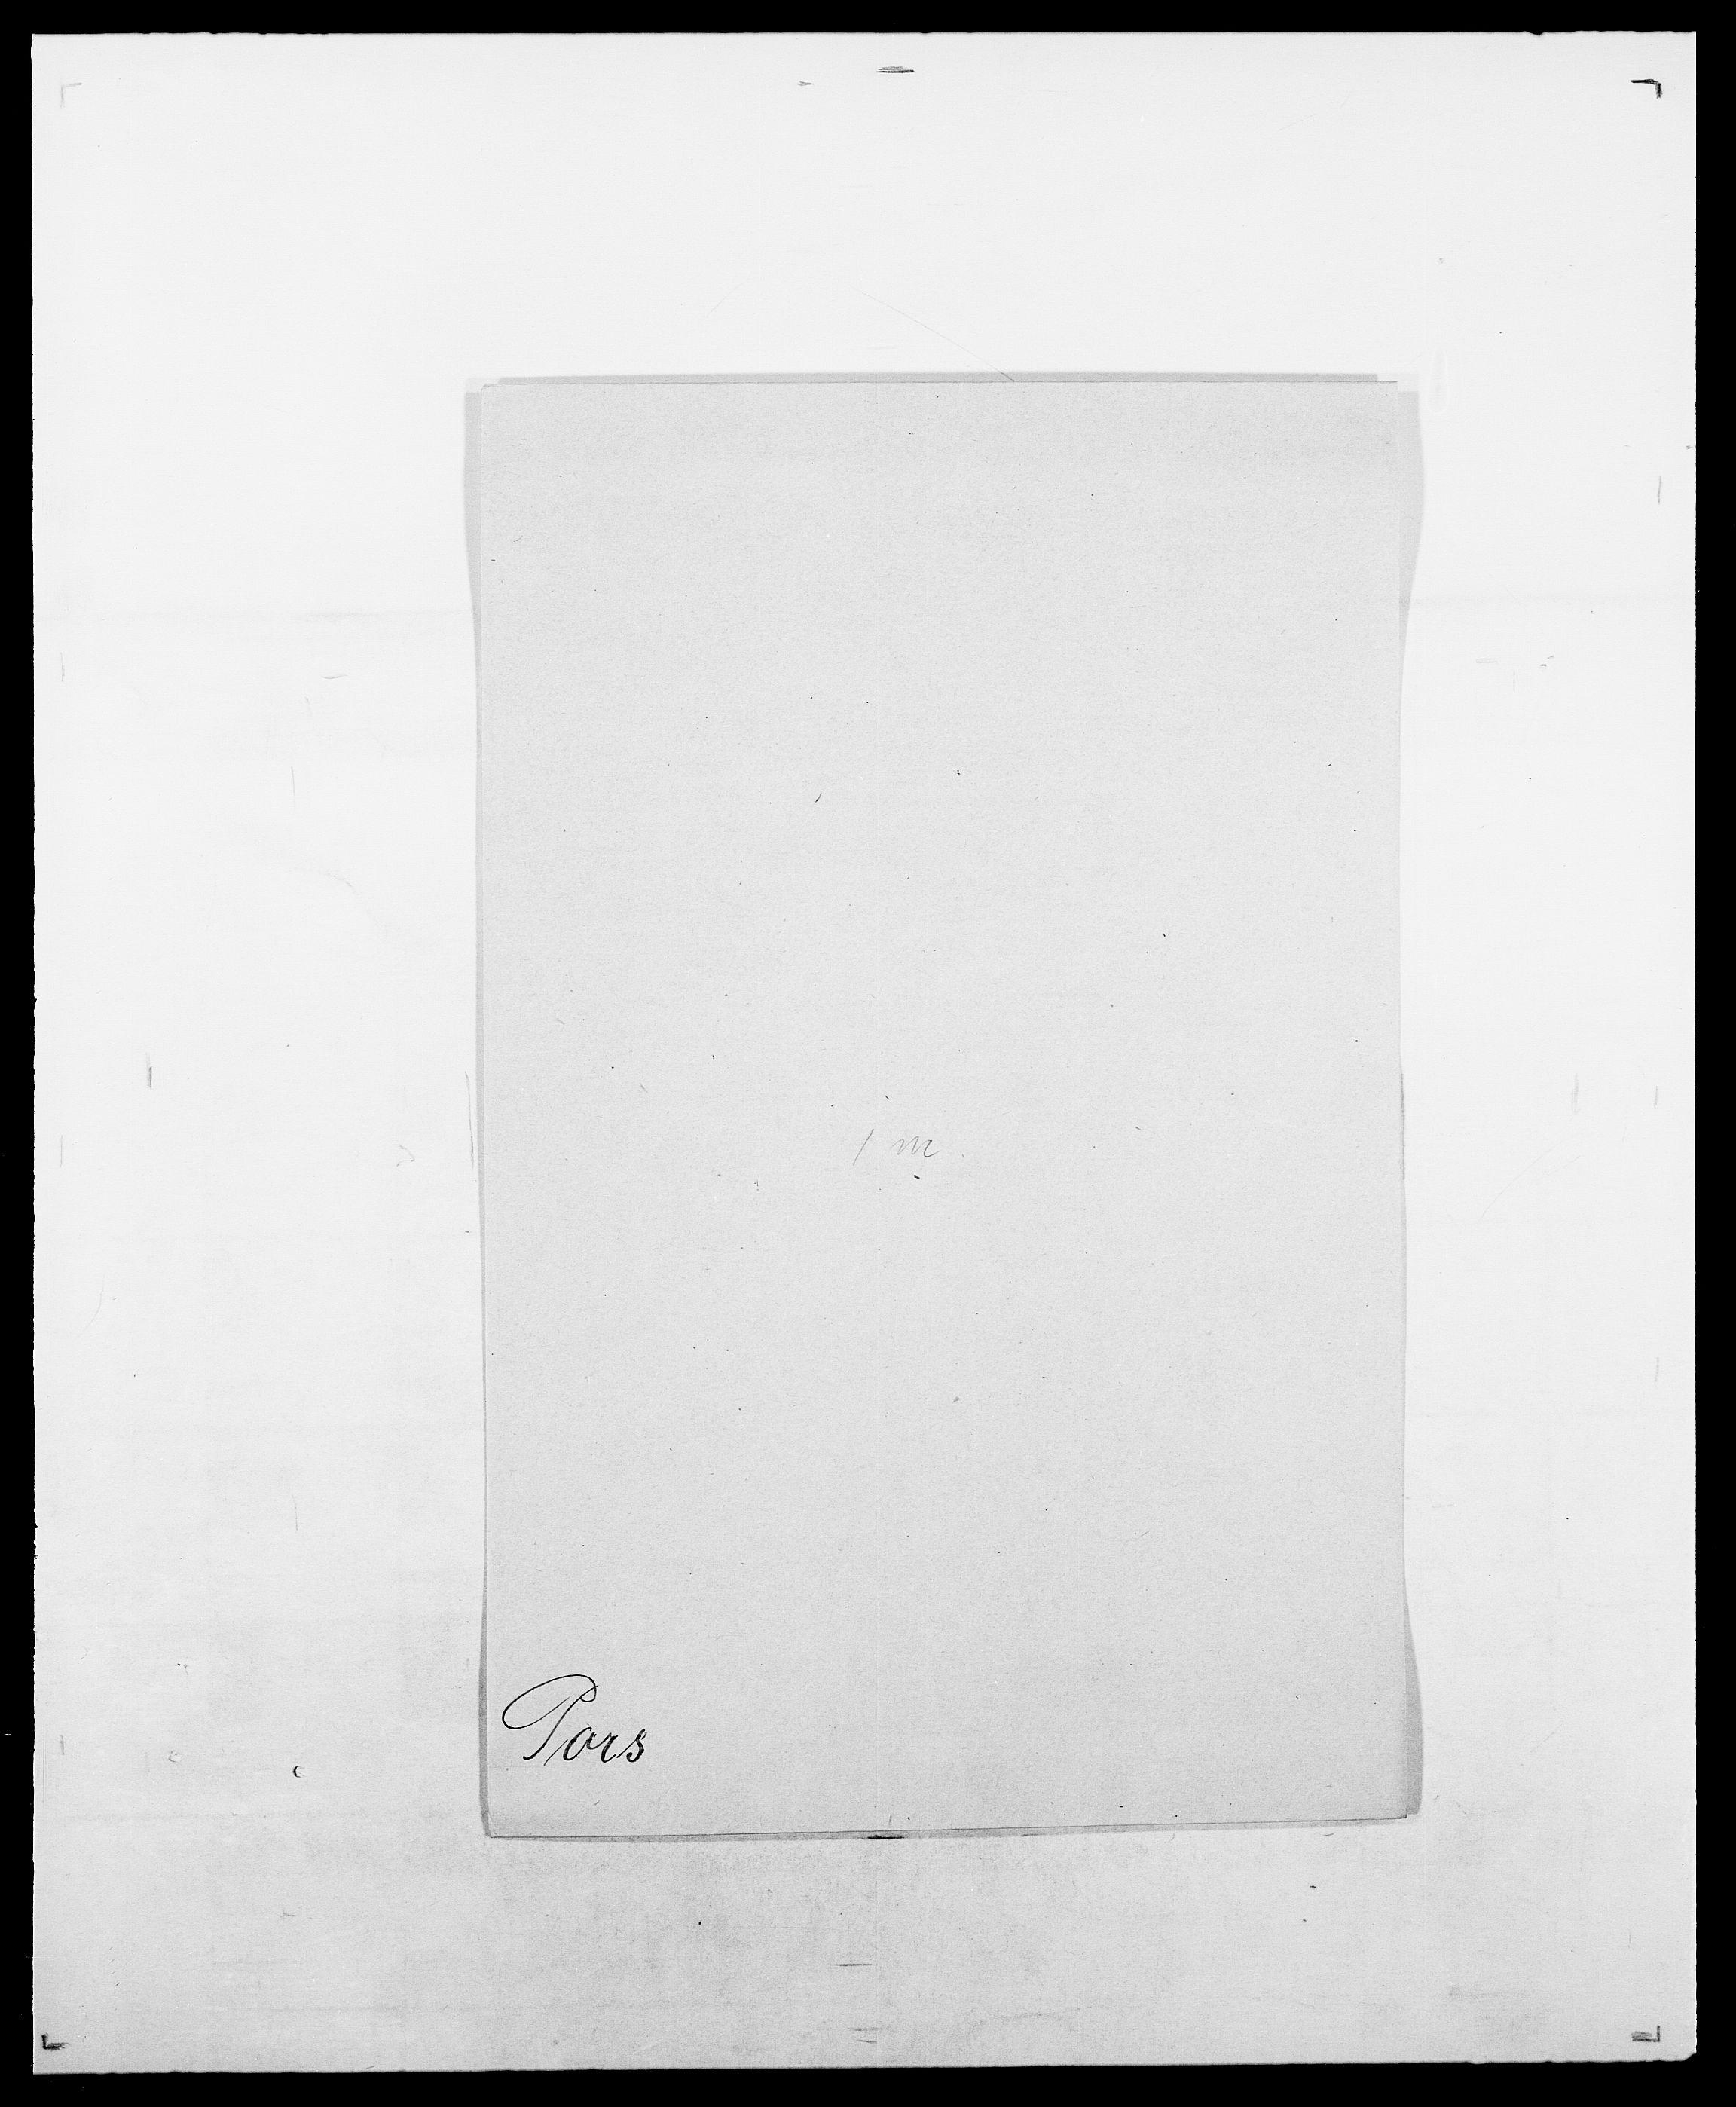 SAO, Delgobe, Charles Antoine - samling, D/Da/L0031: de Place - Raaum, s. 235